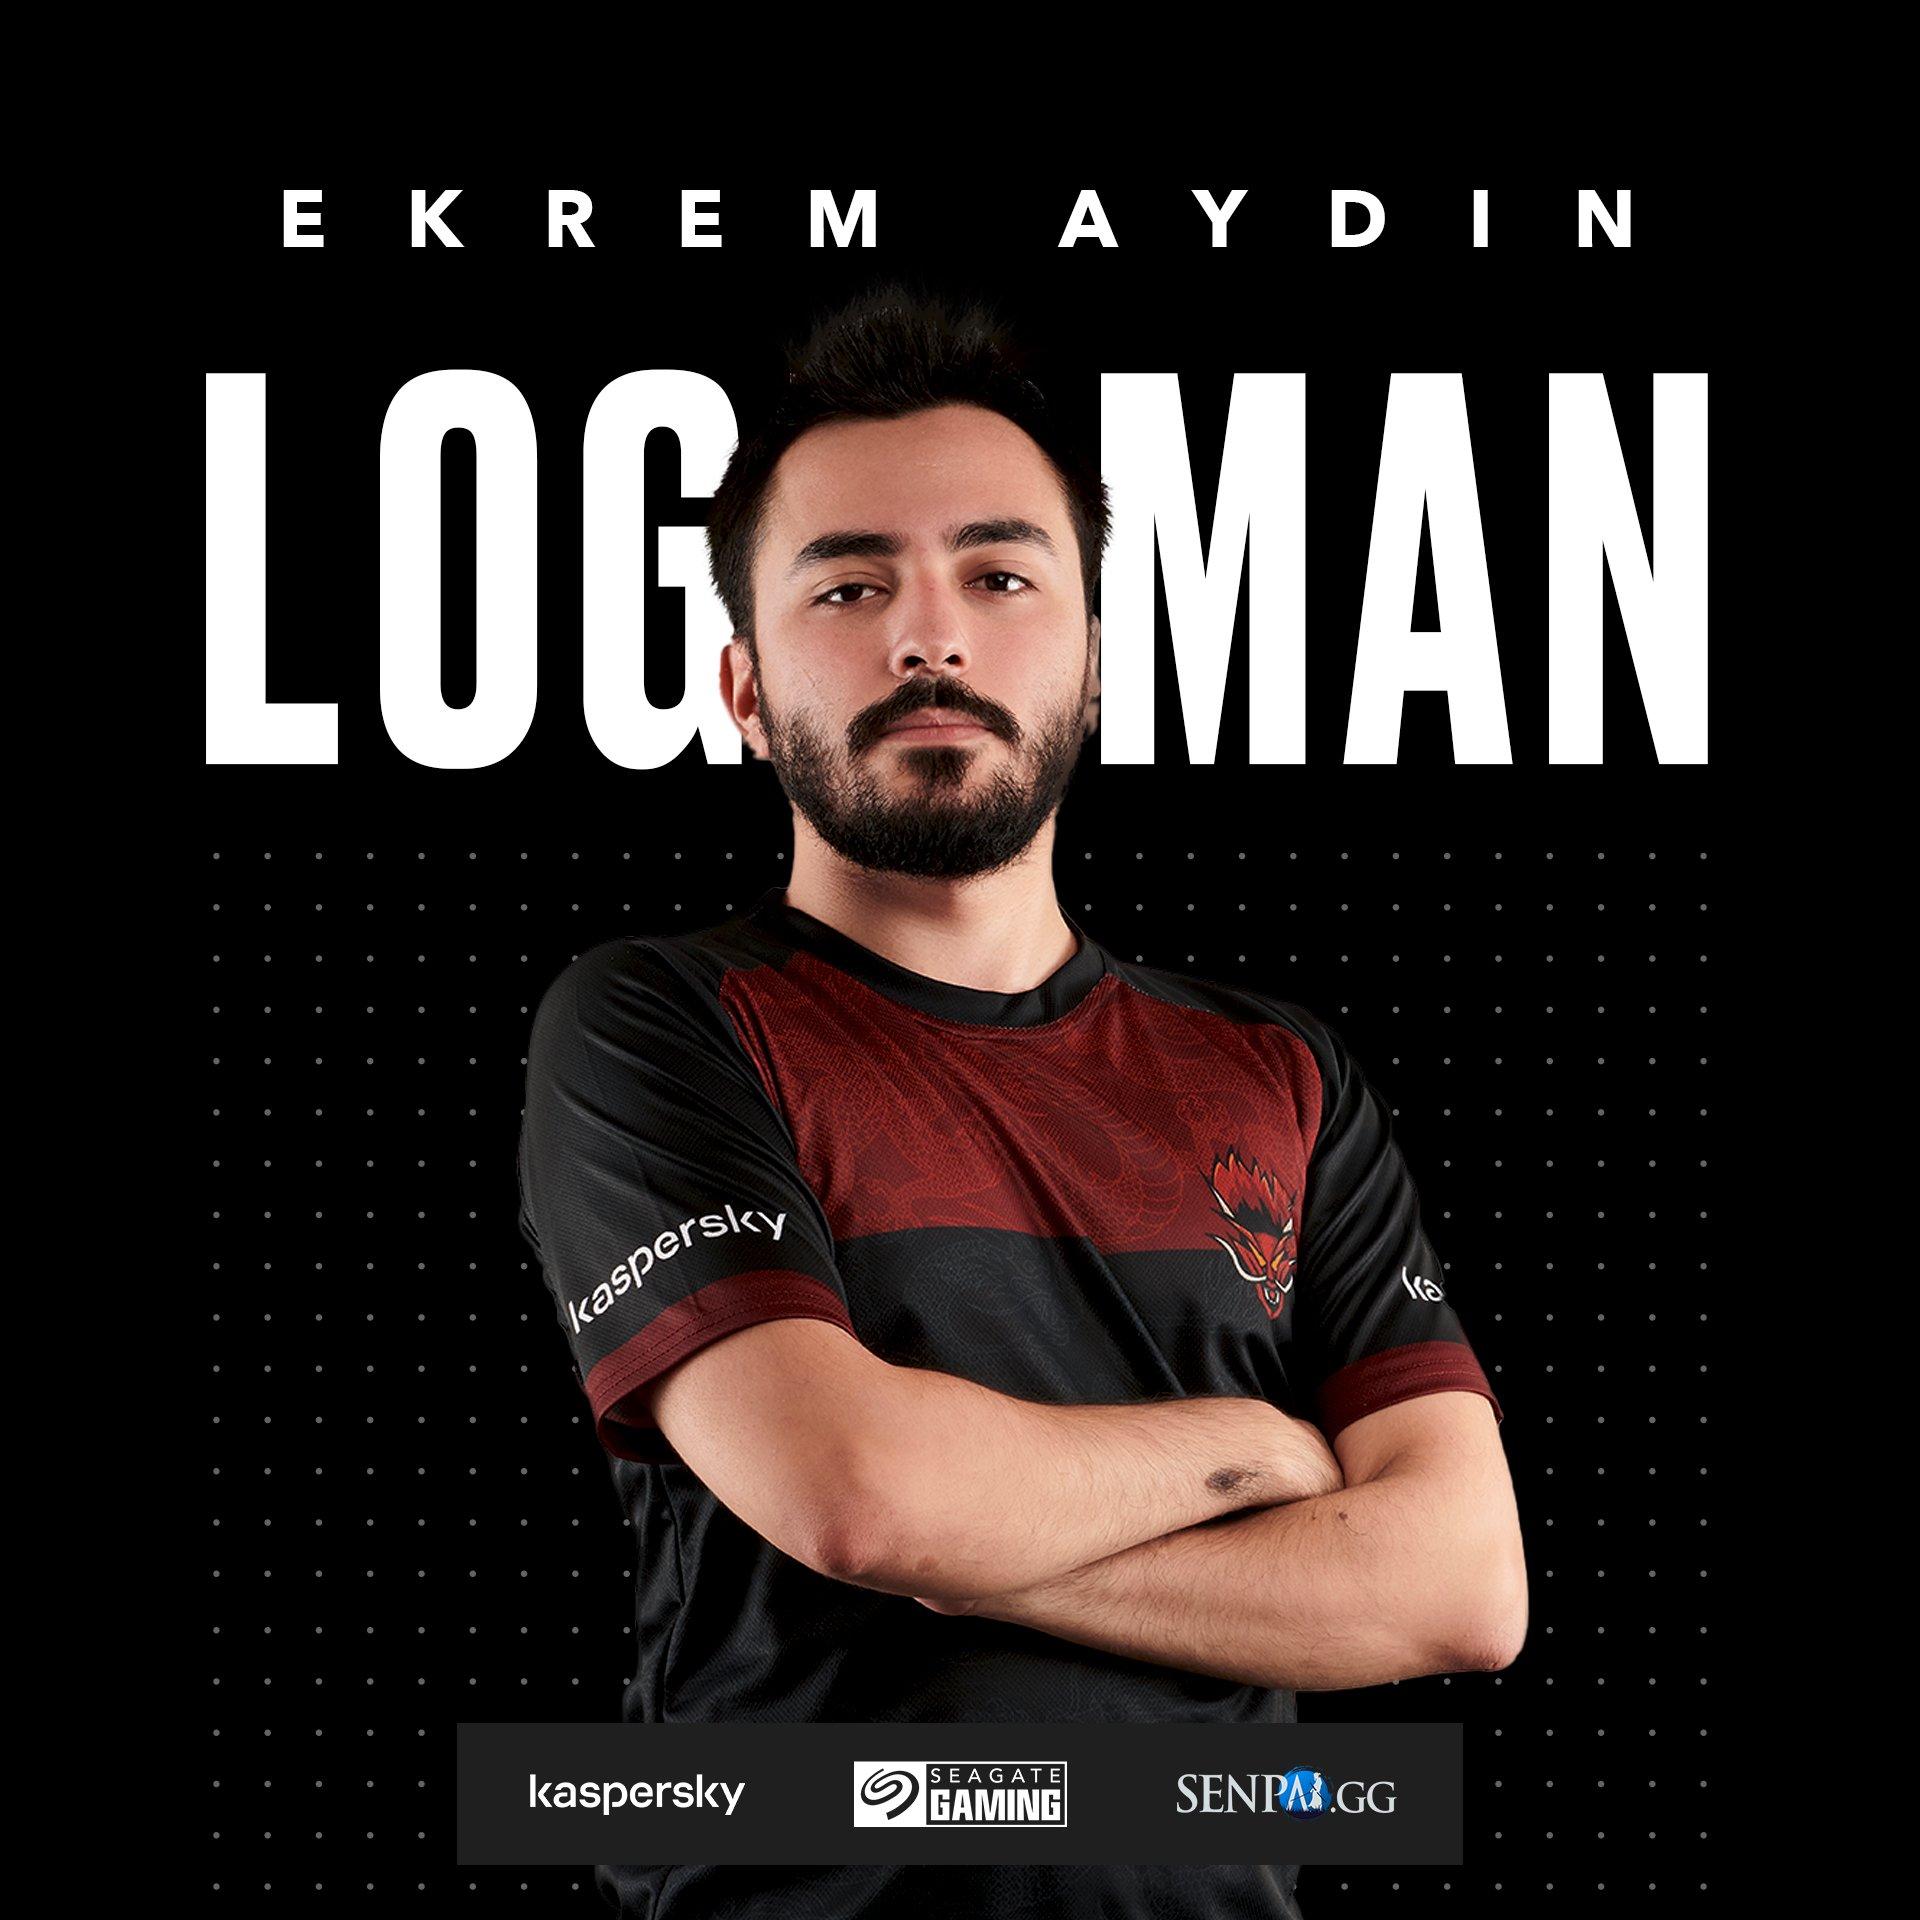 Logicman